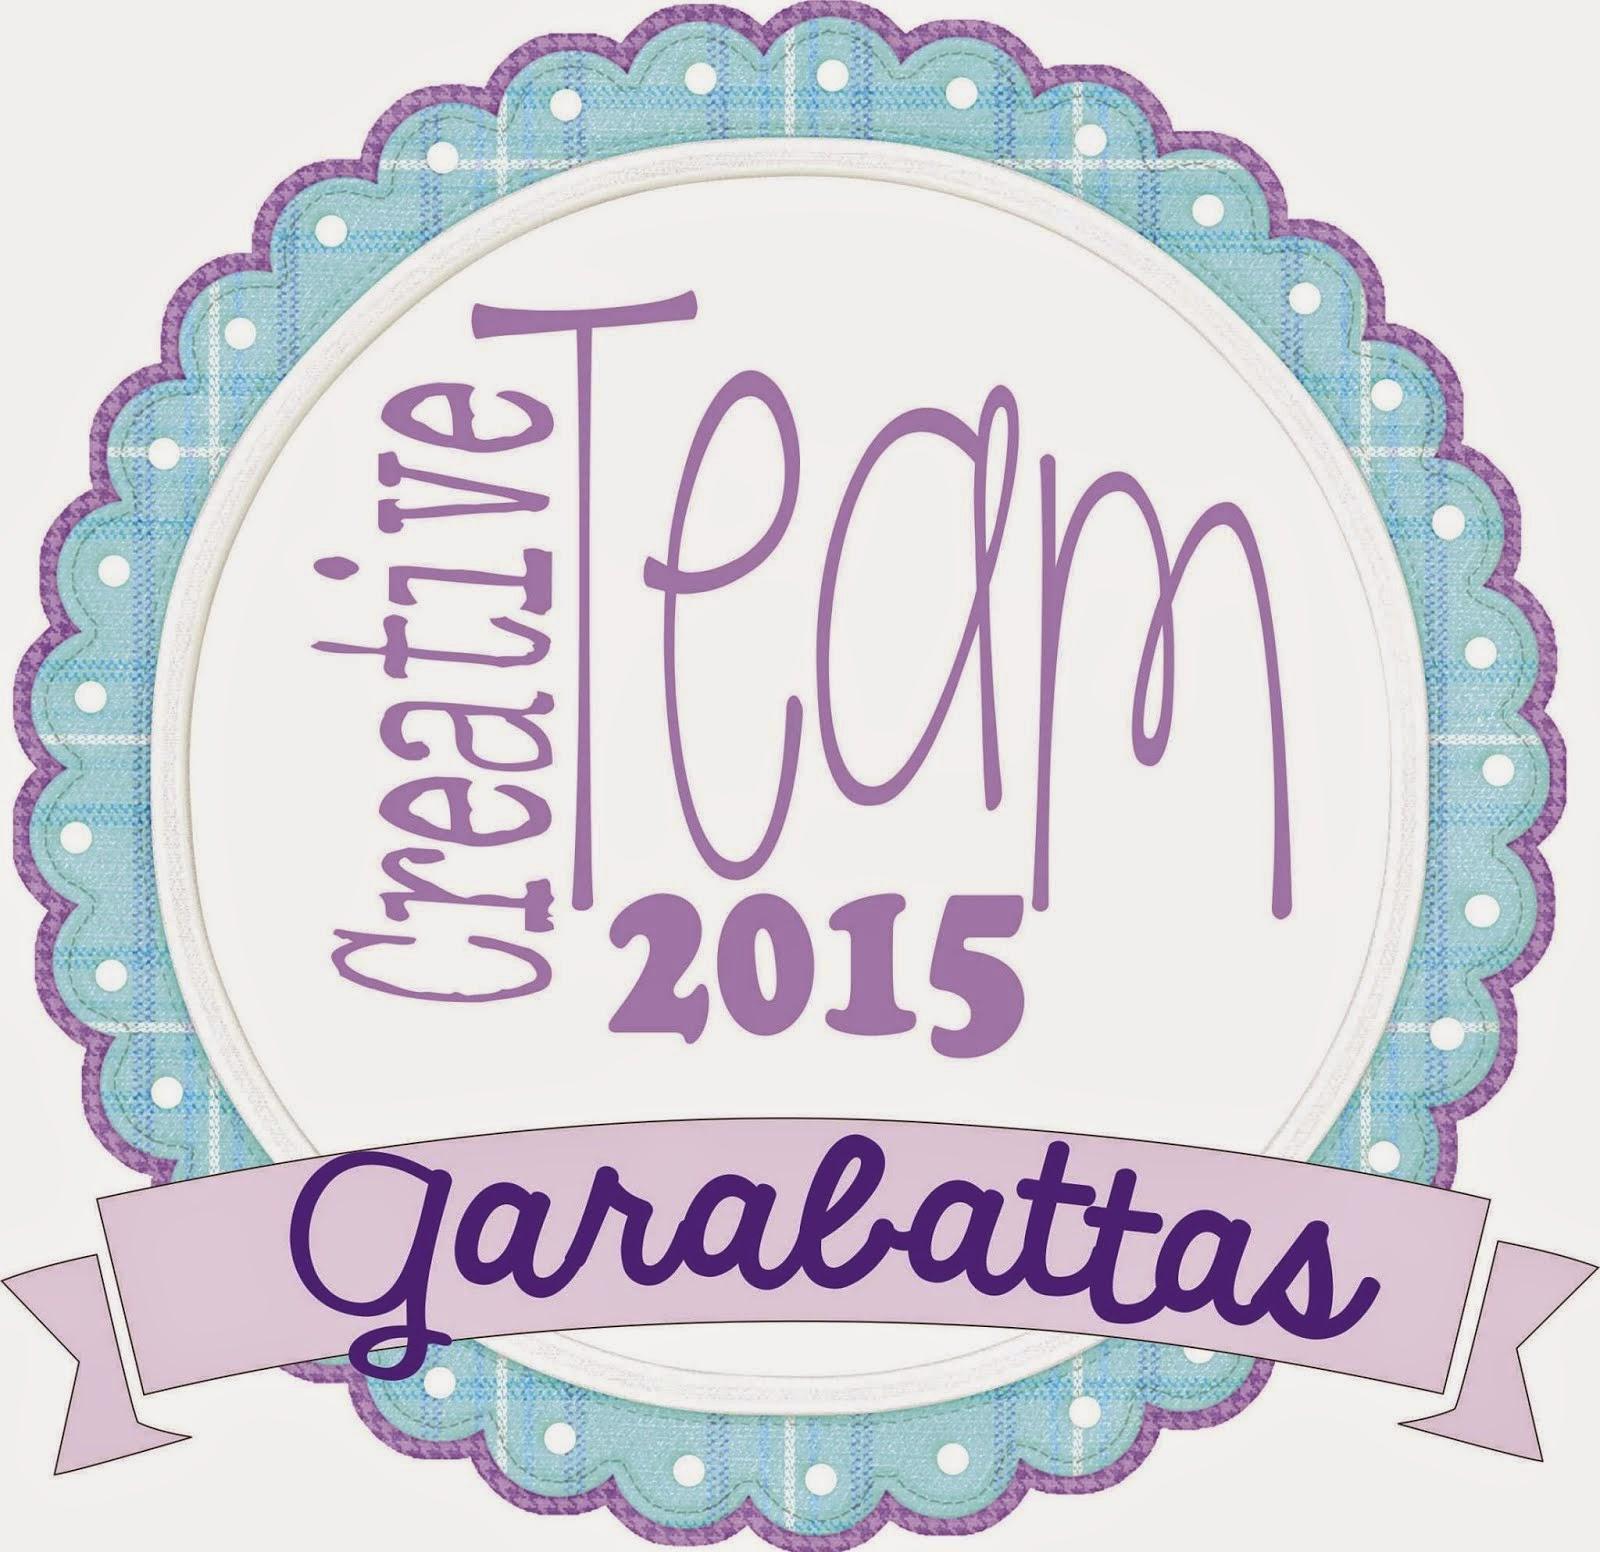 CT Garabattas 2015